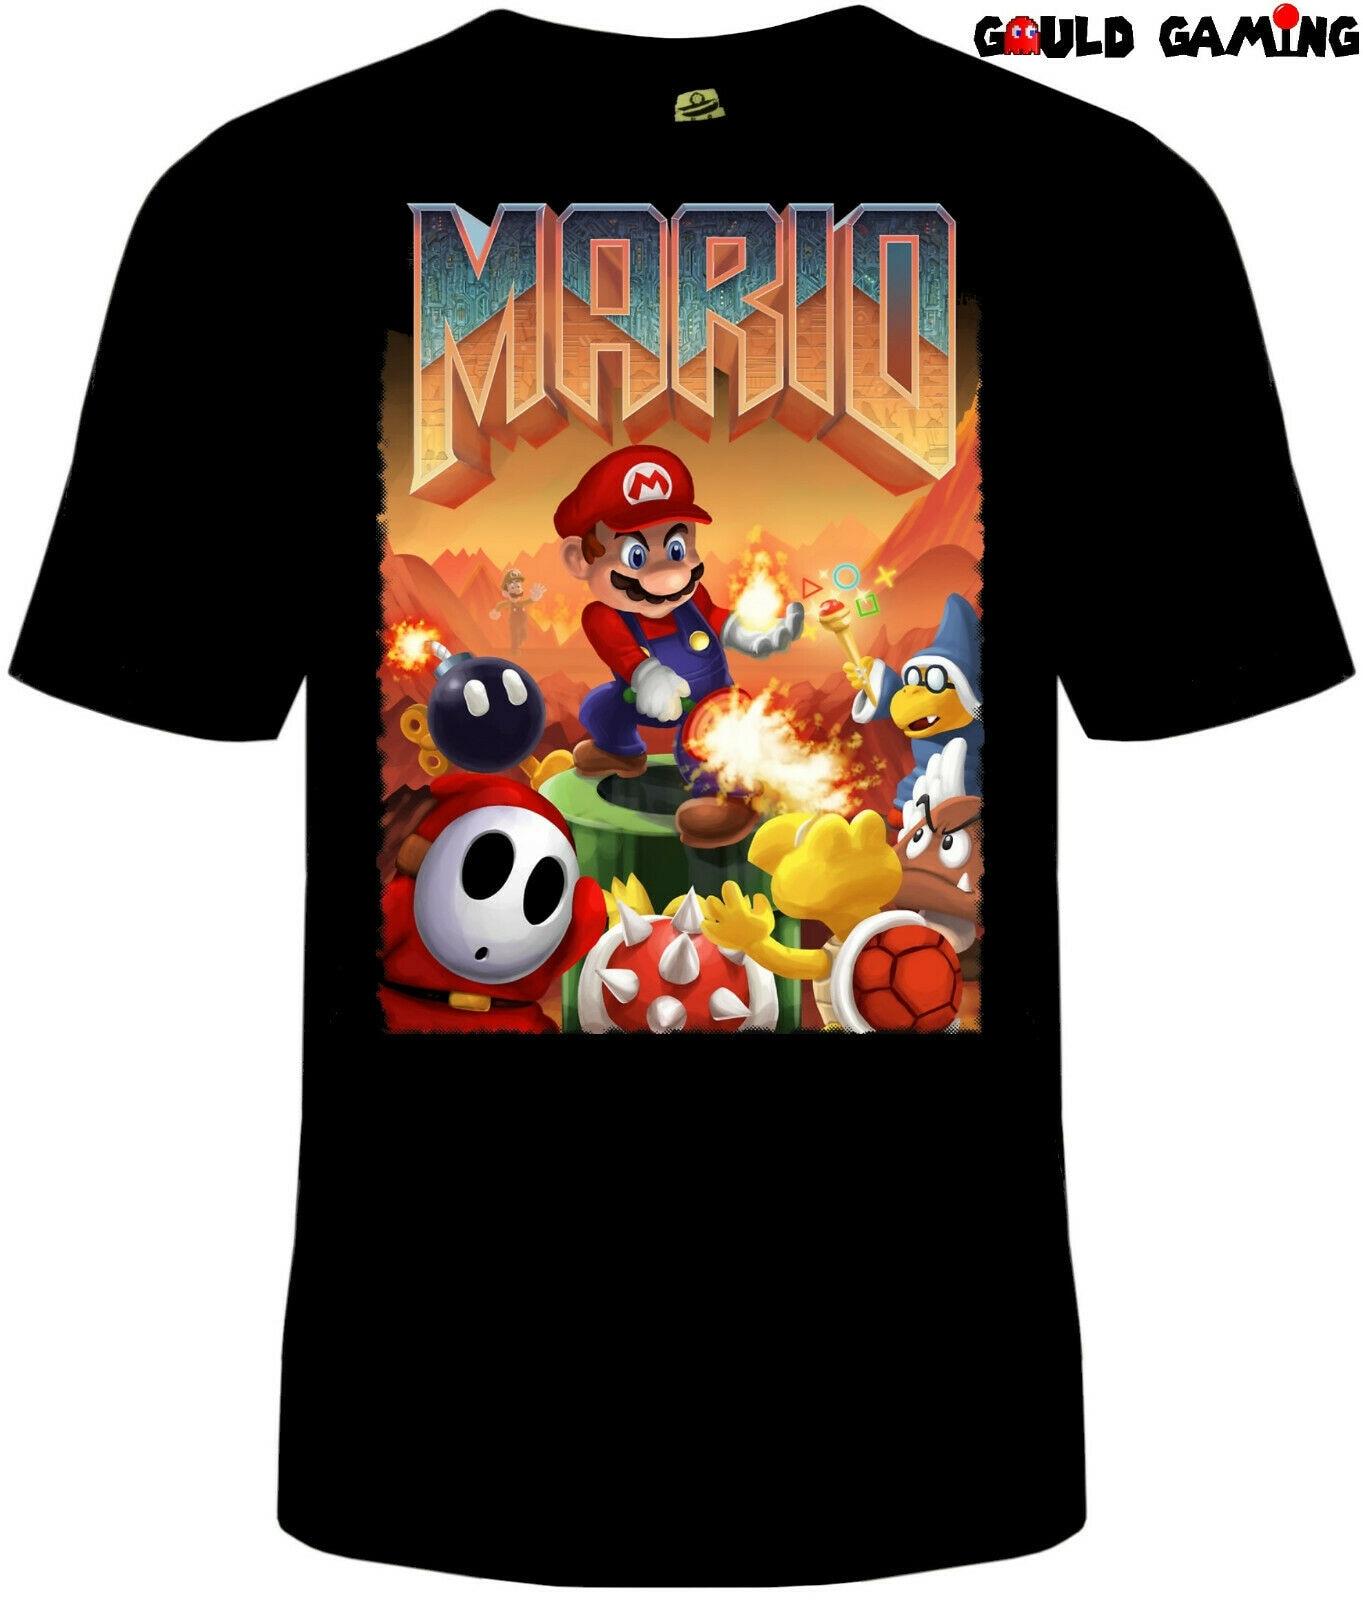 Doom Super Mario camiseta Unisex algodón adulto divertido videojuego Retro Guns nuevo